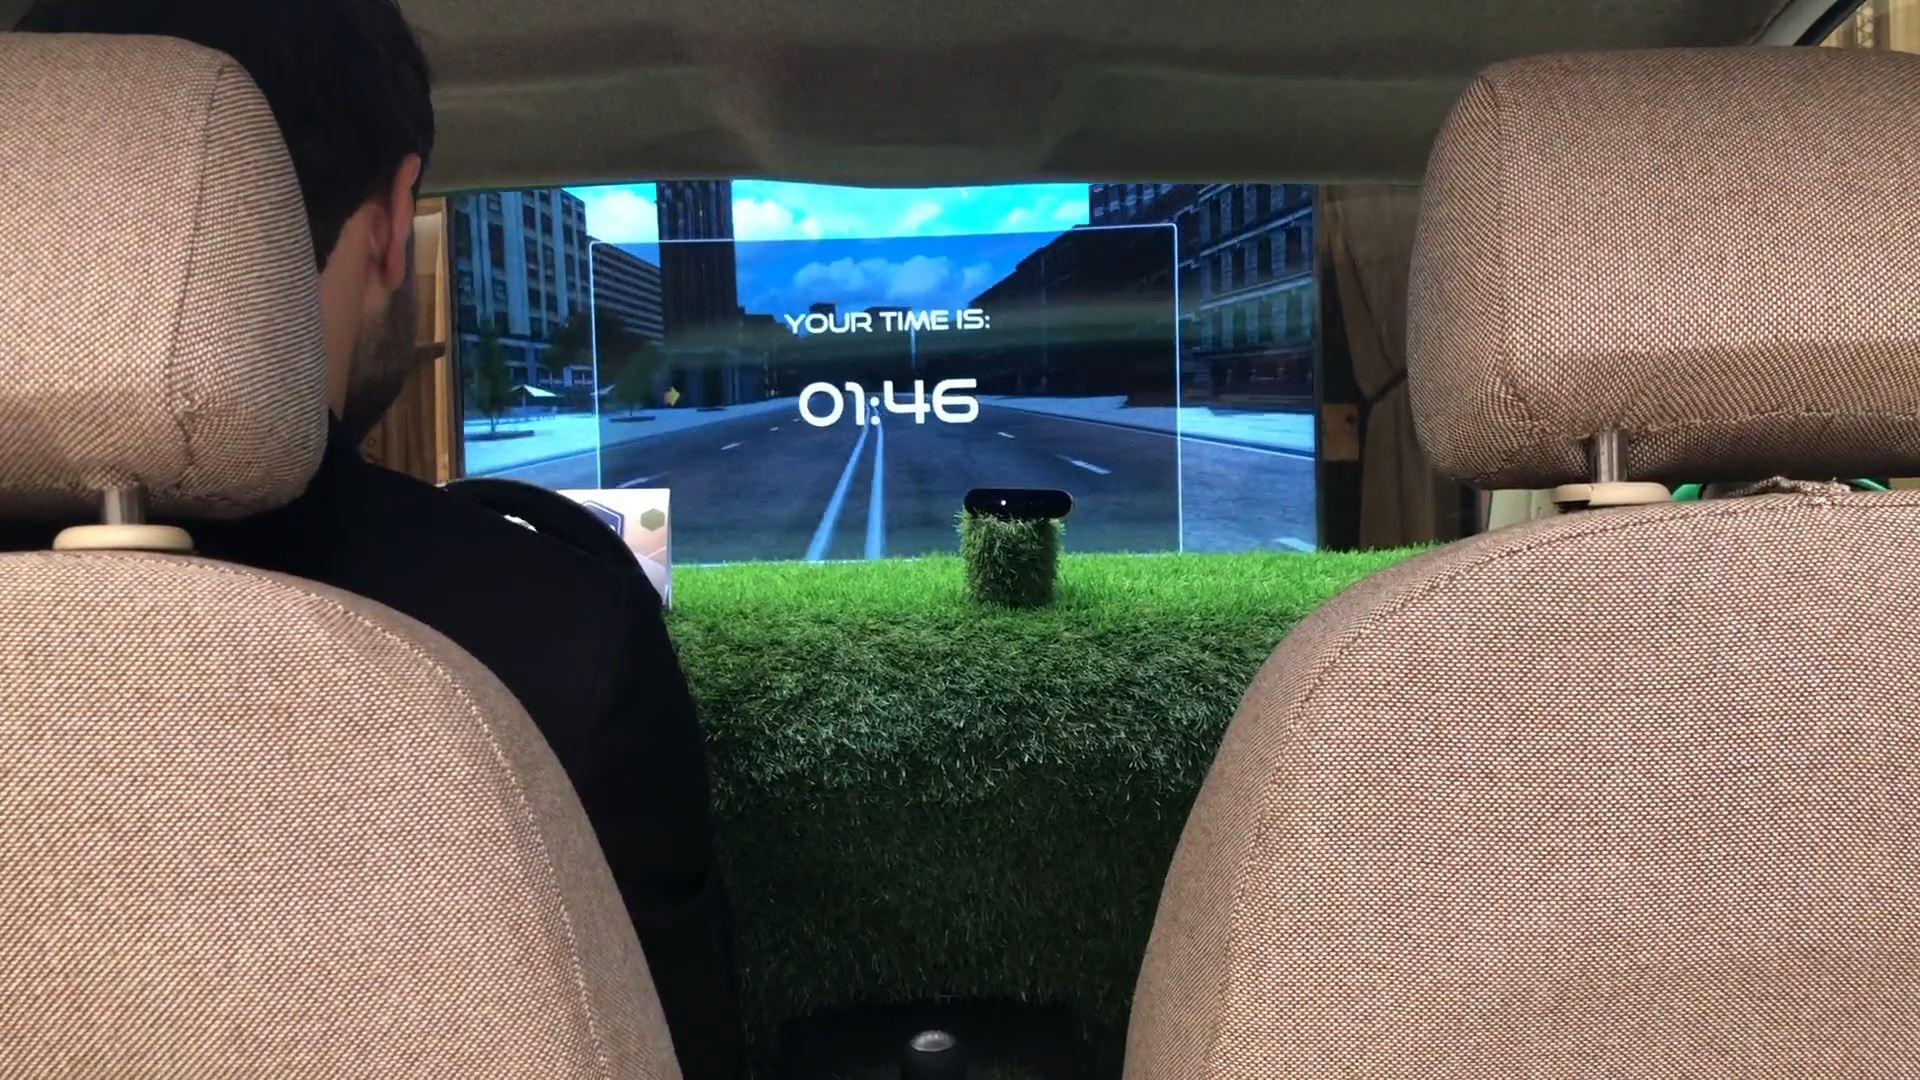 sharjah e-Government retreat interactive technology integration car racing simulator